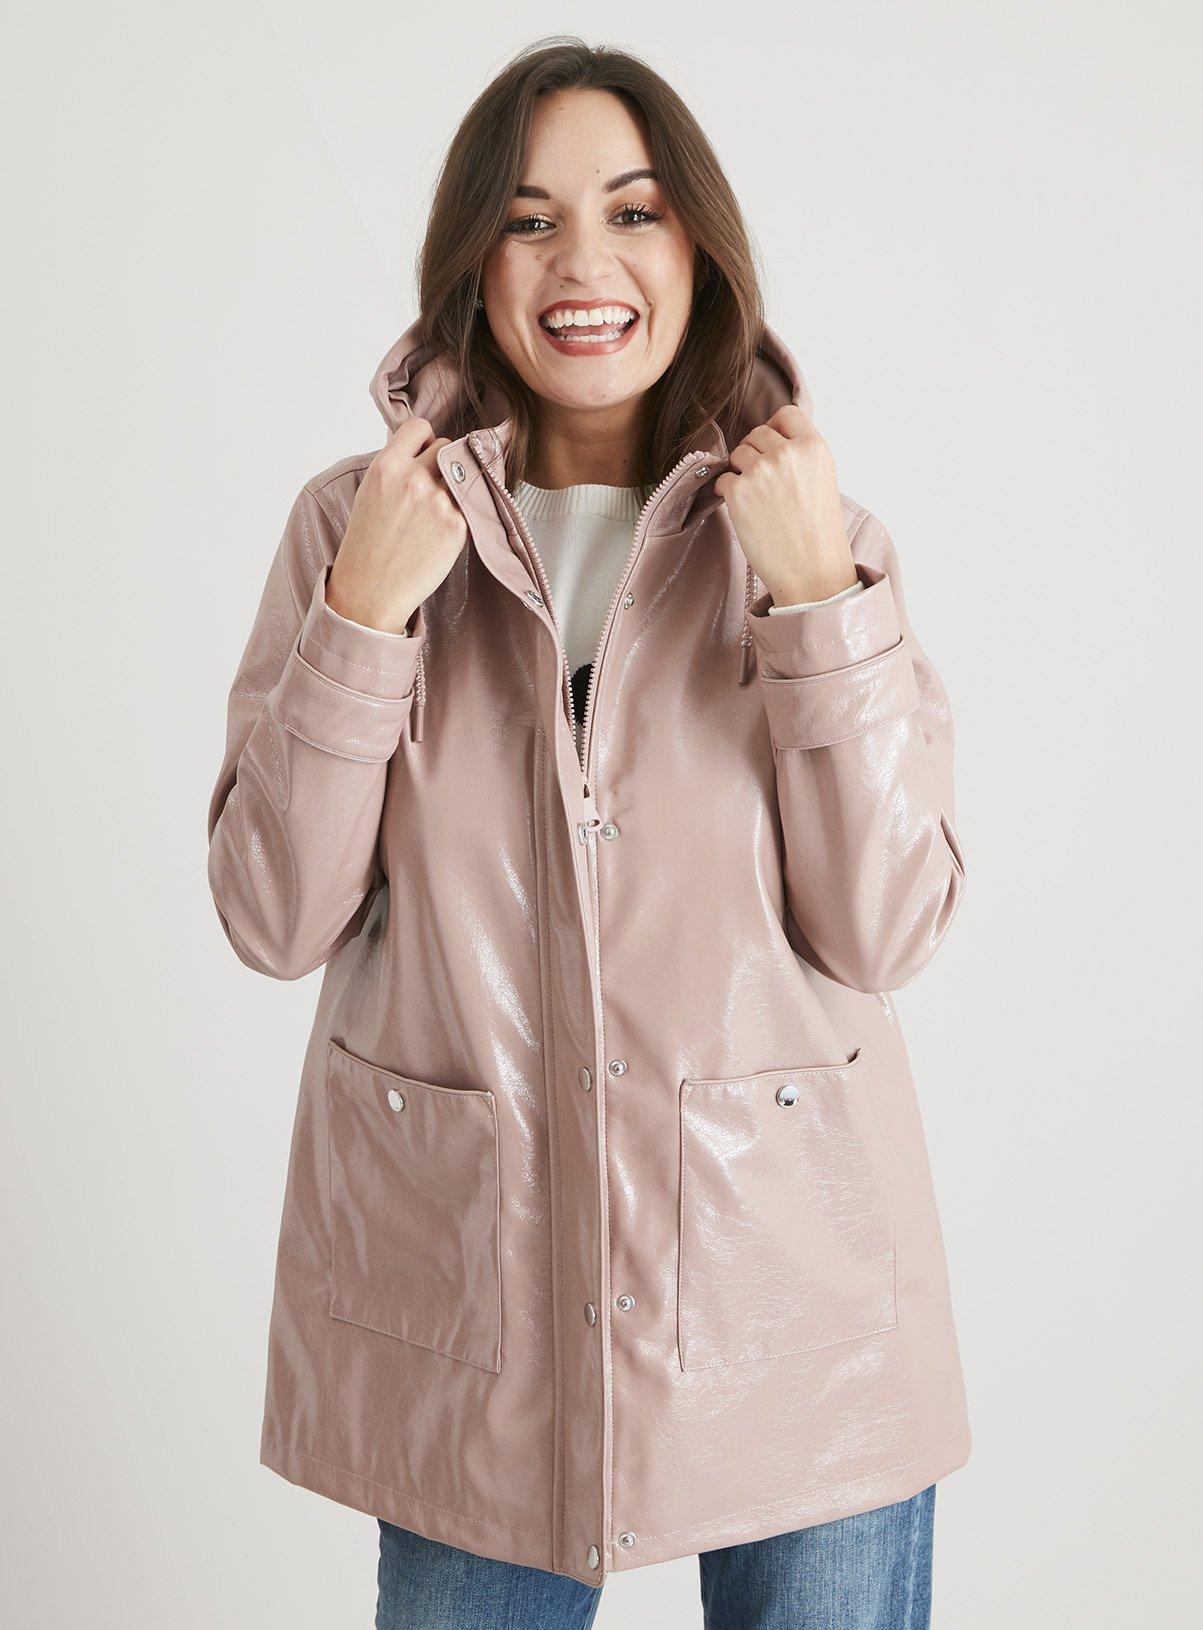 Pink Shower Resistant Vinyl Rubber Raincoat - 10